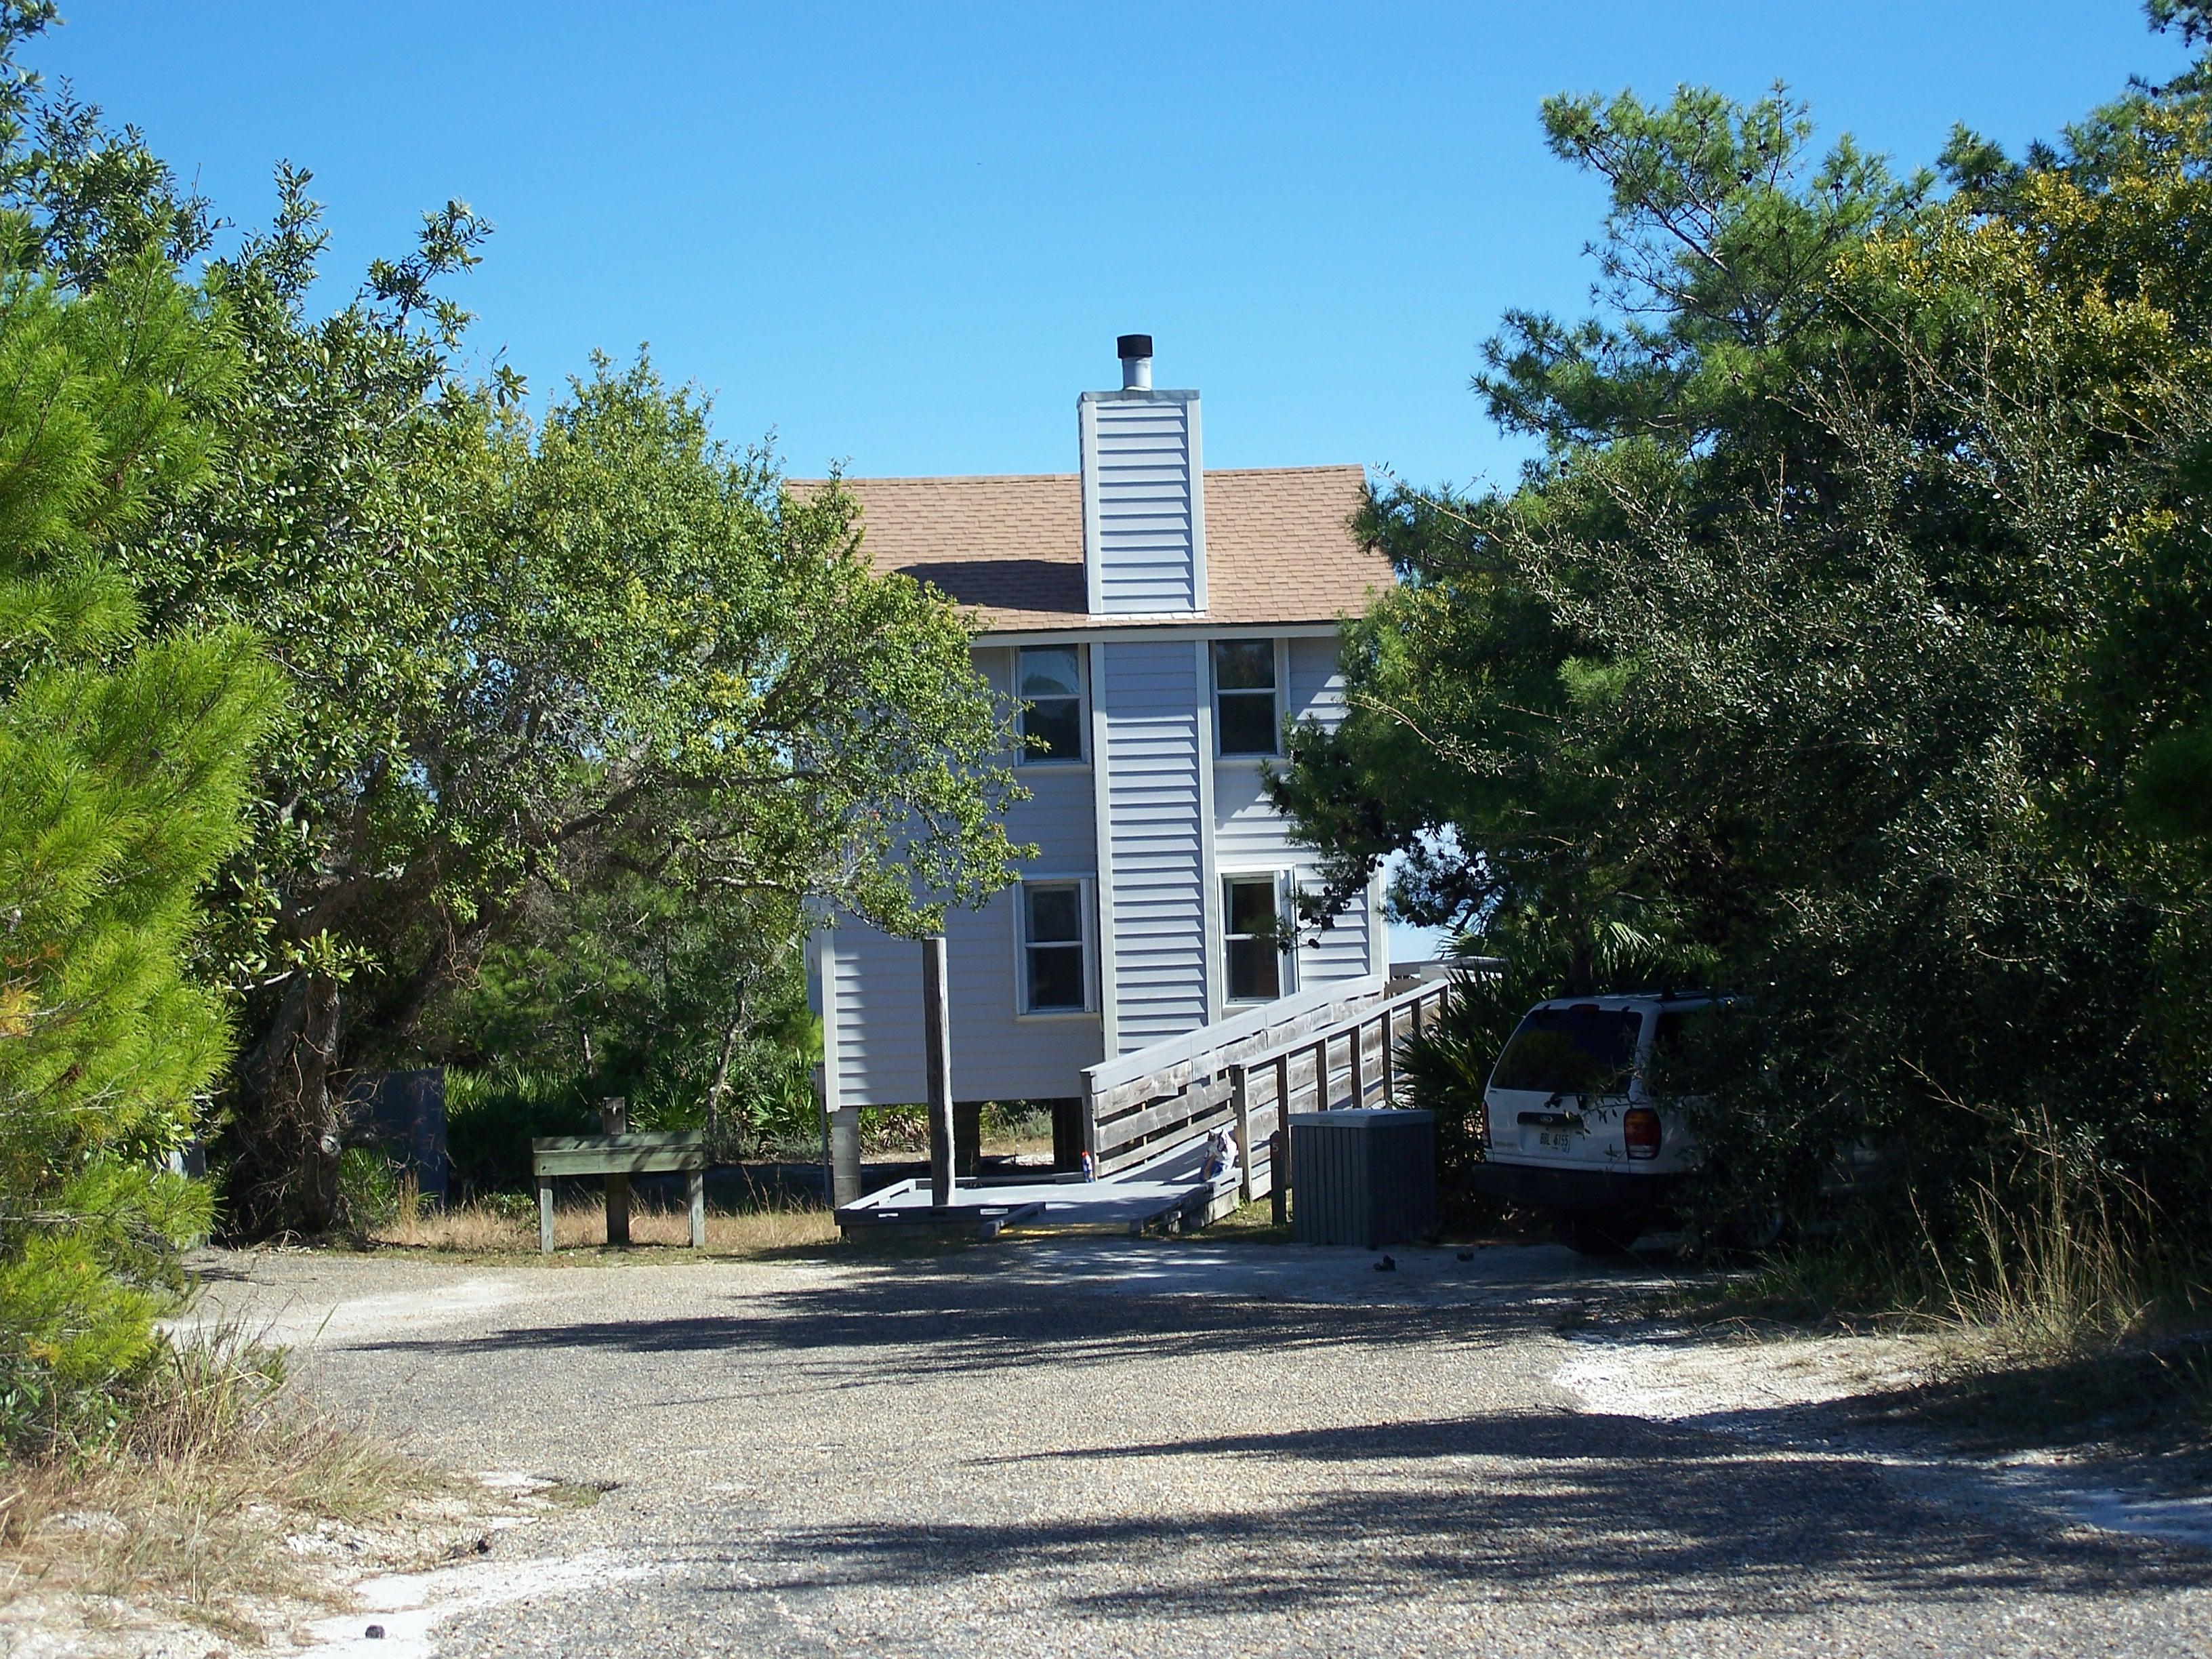 Charmant File:St Joseph Peninsula FL SP Cabin01